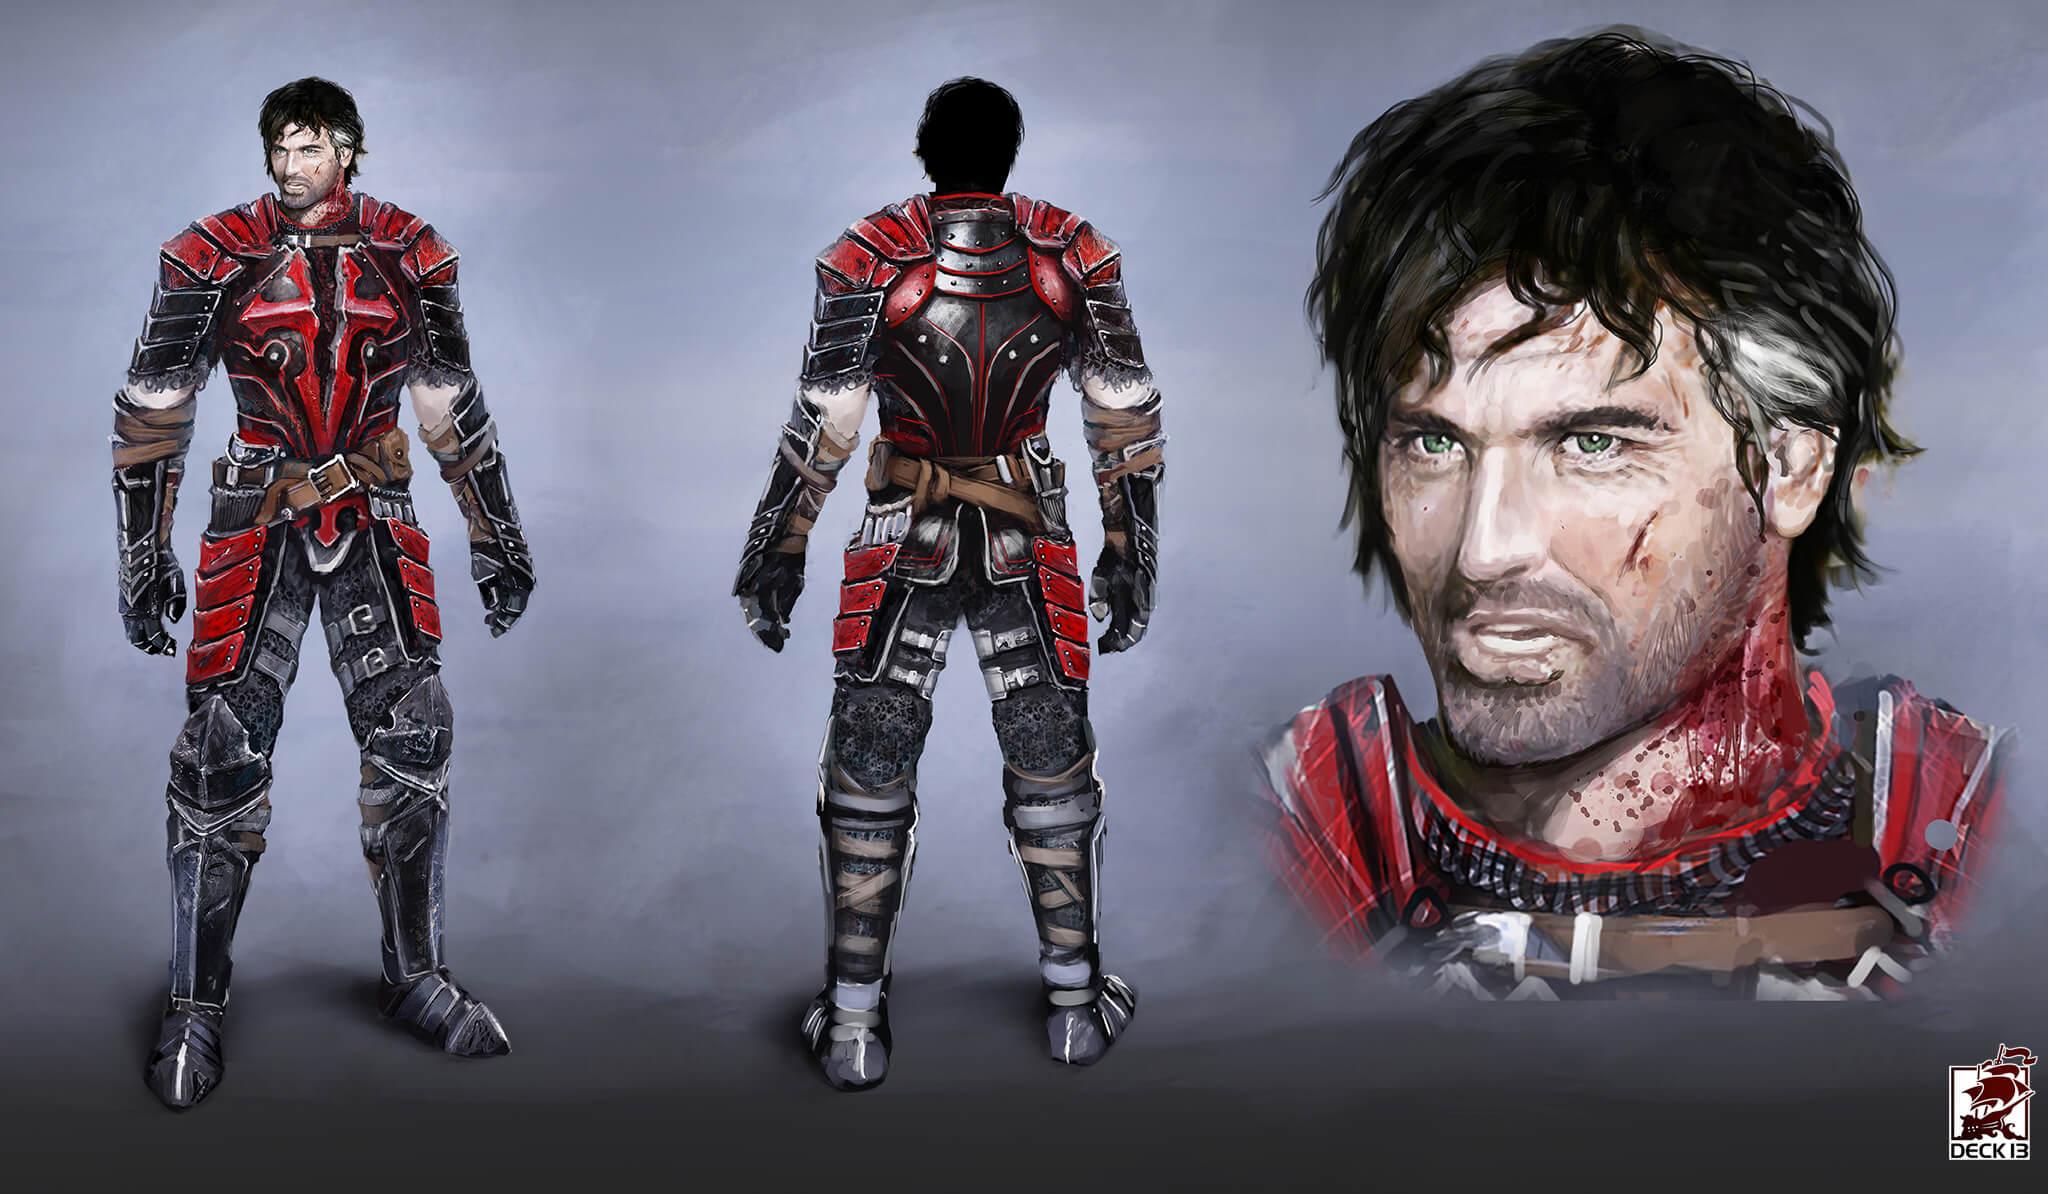 blood-knights-character-concept-art-felix-haas-main_character_armor006